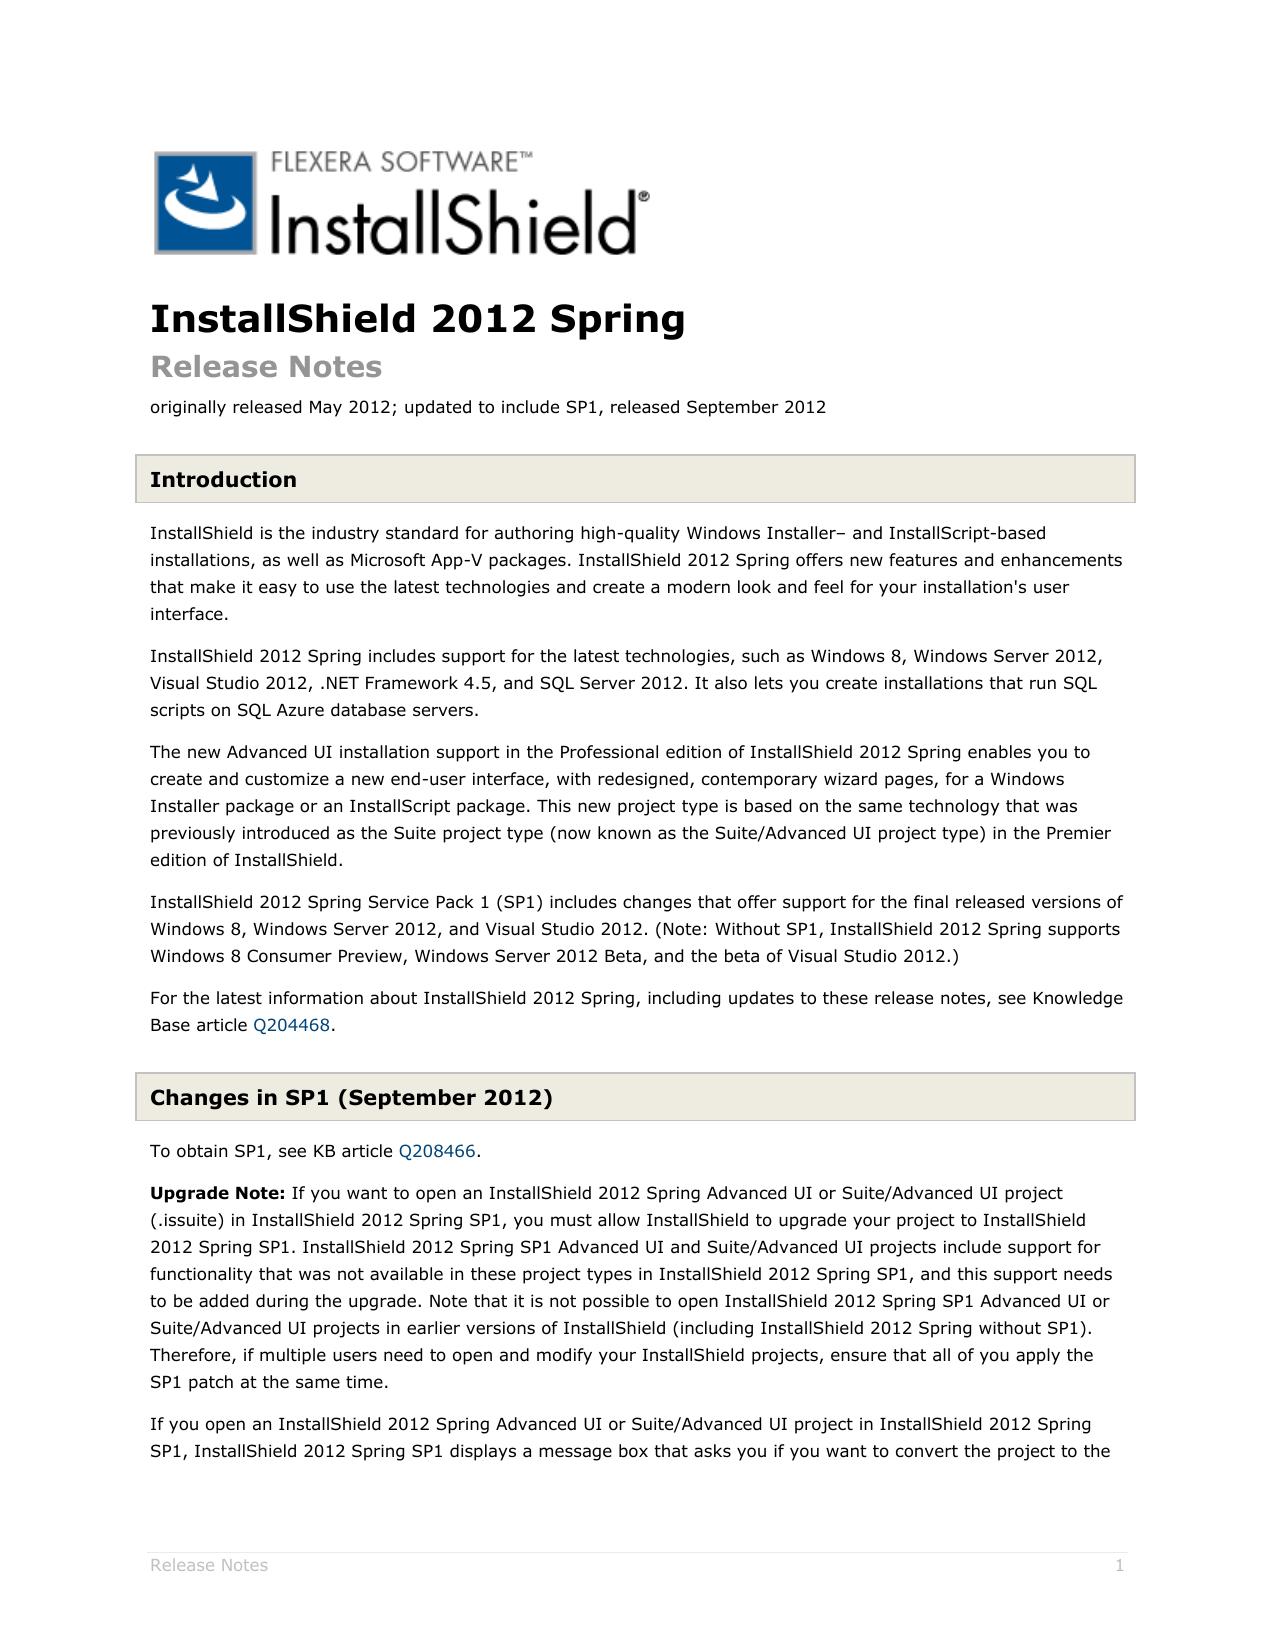 InstallShield 2012 Spring/InstallShield 2012 Spring SP1